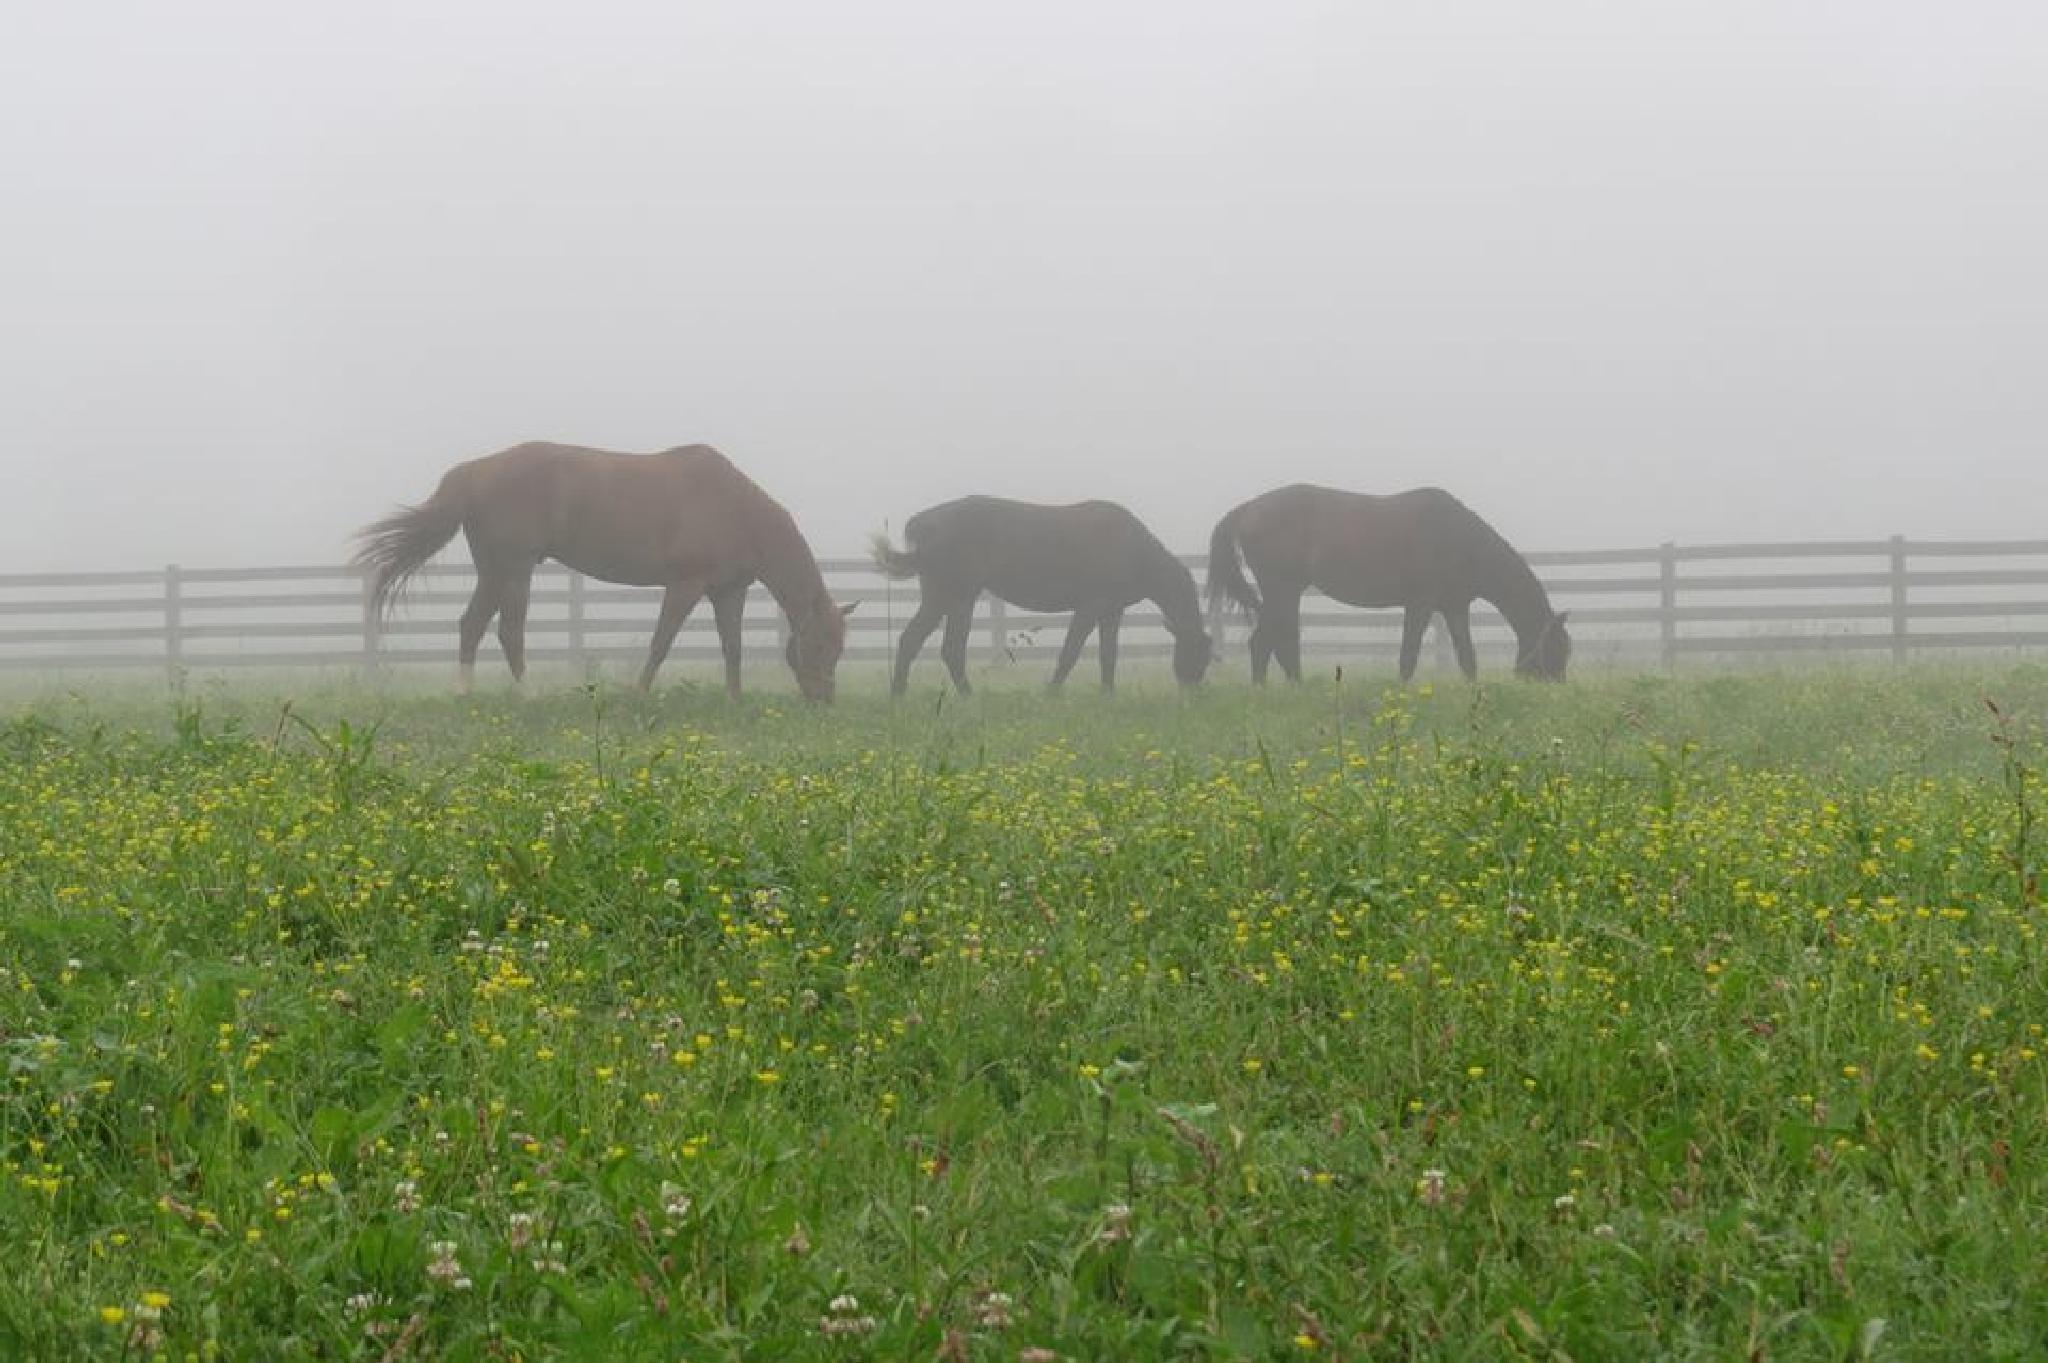 Muggy Summer Morning by sarahjones1624